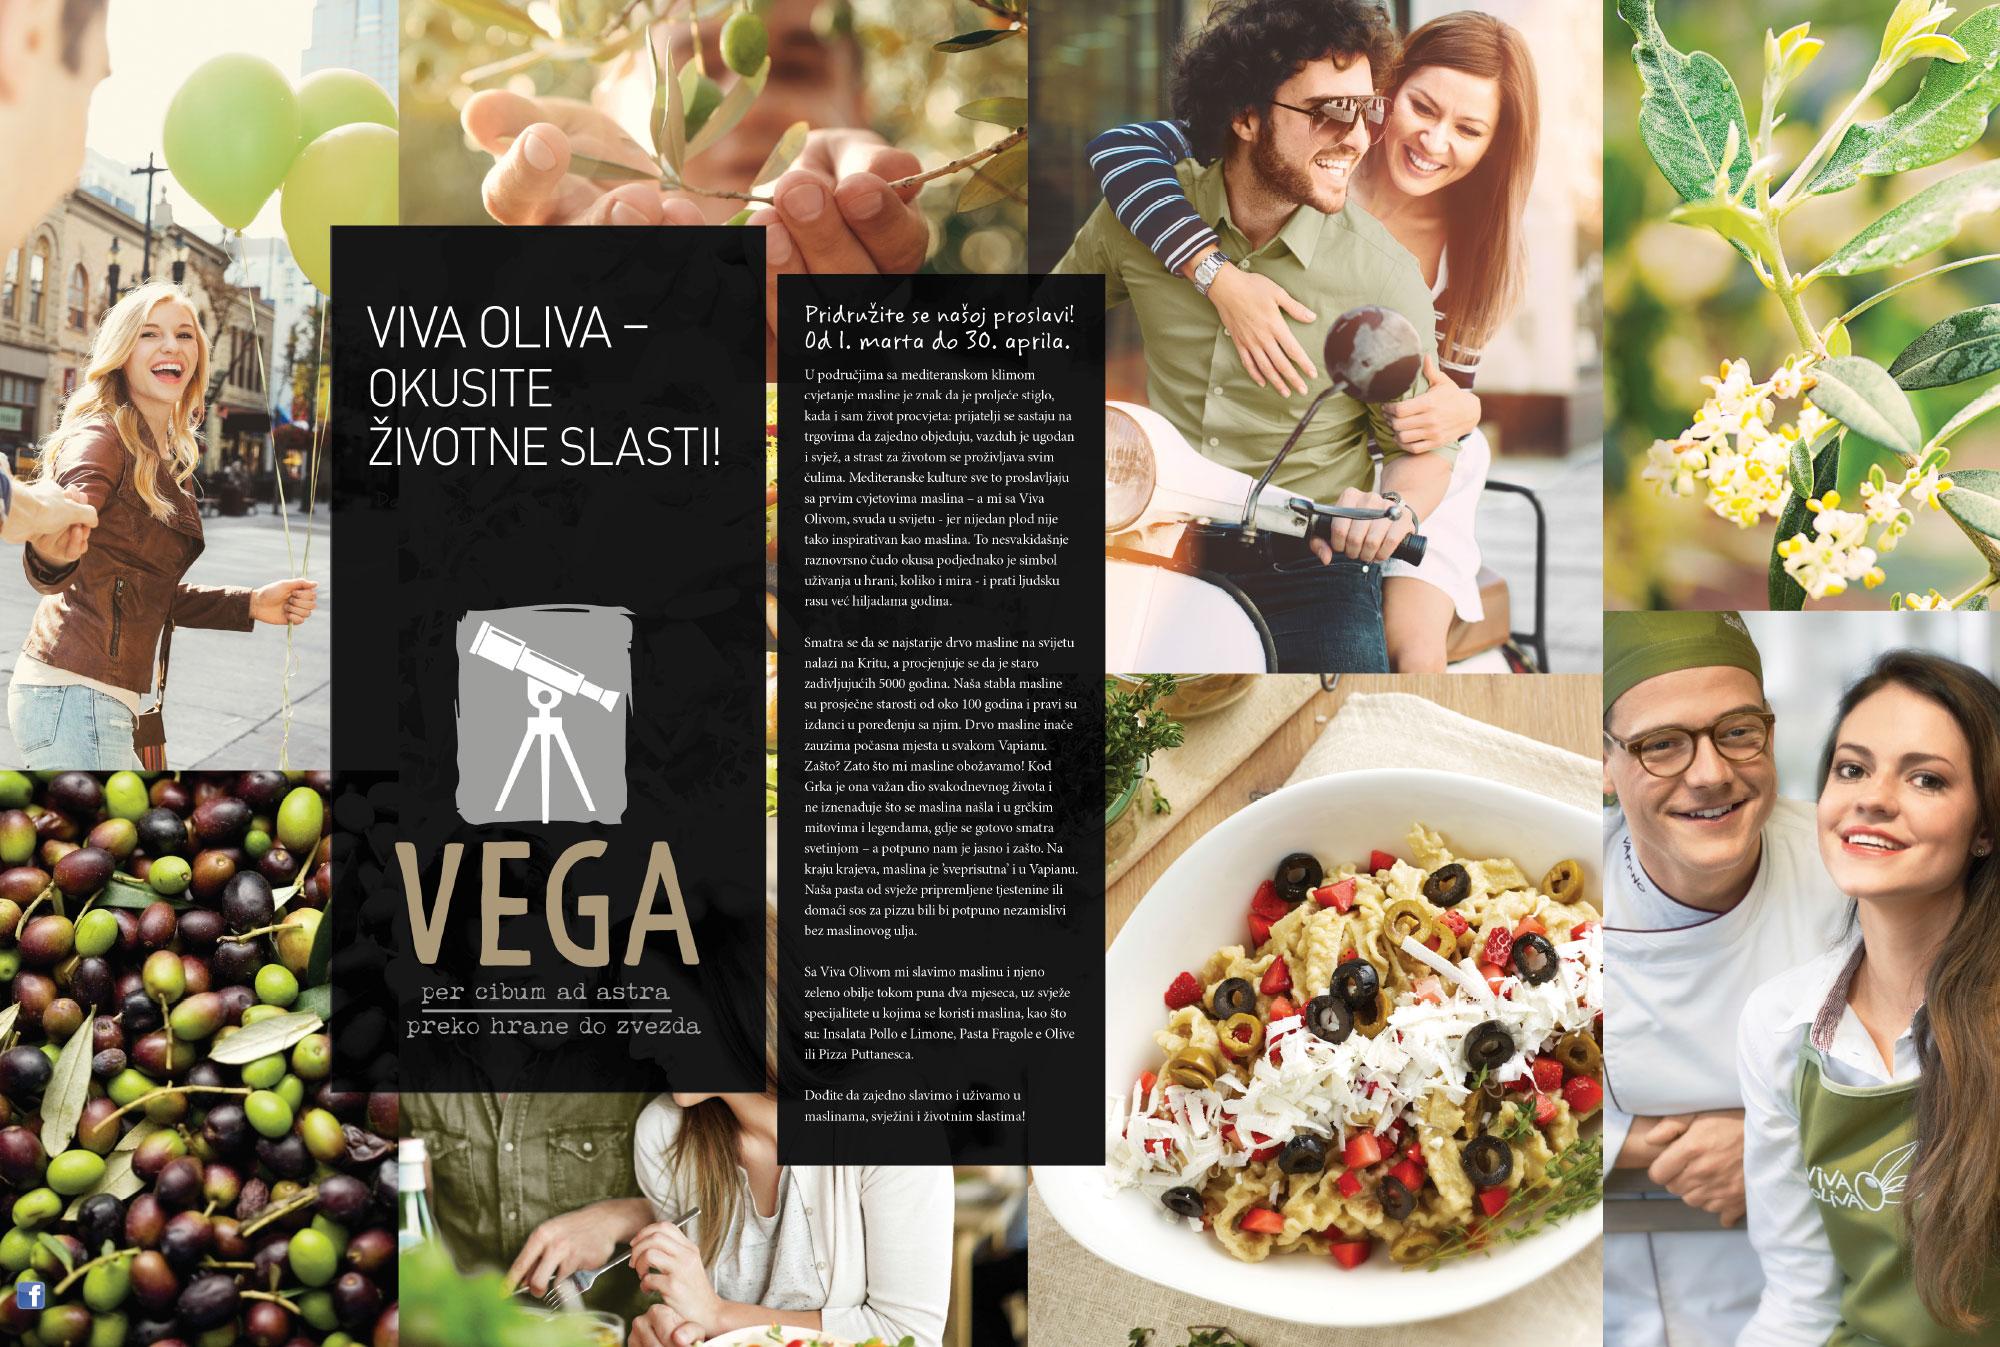 vega poster 5